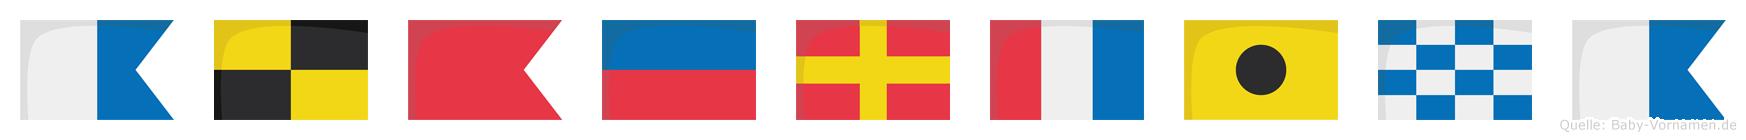 Albertina im Flaggenalphabet